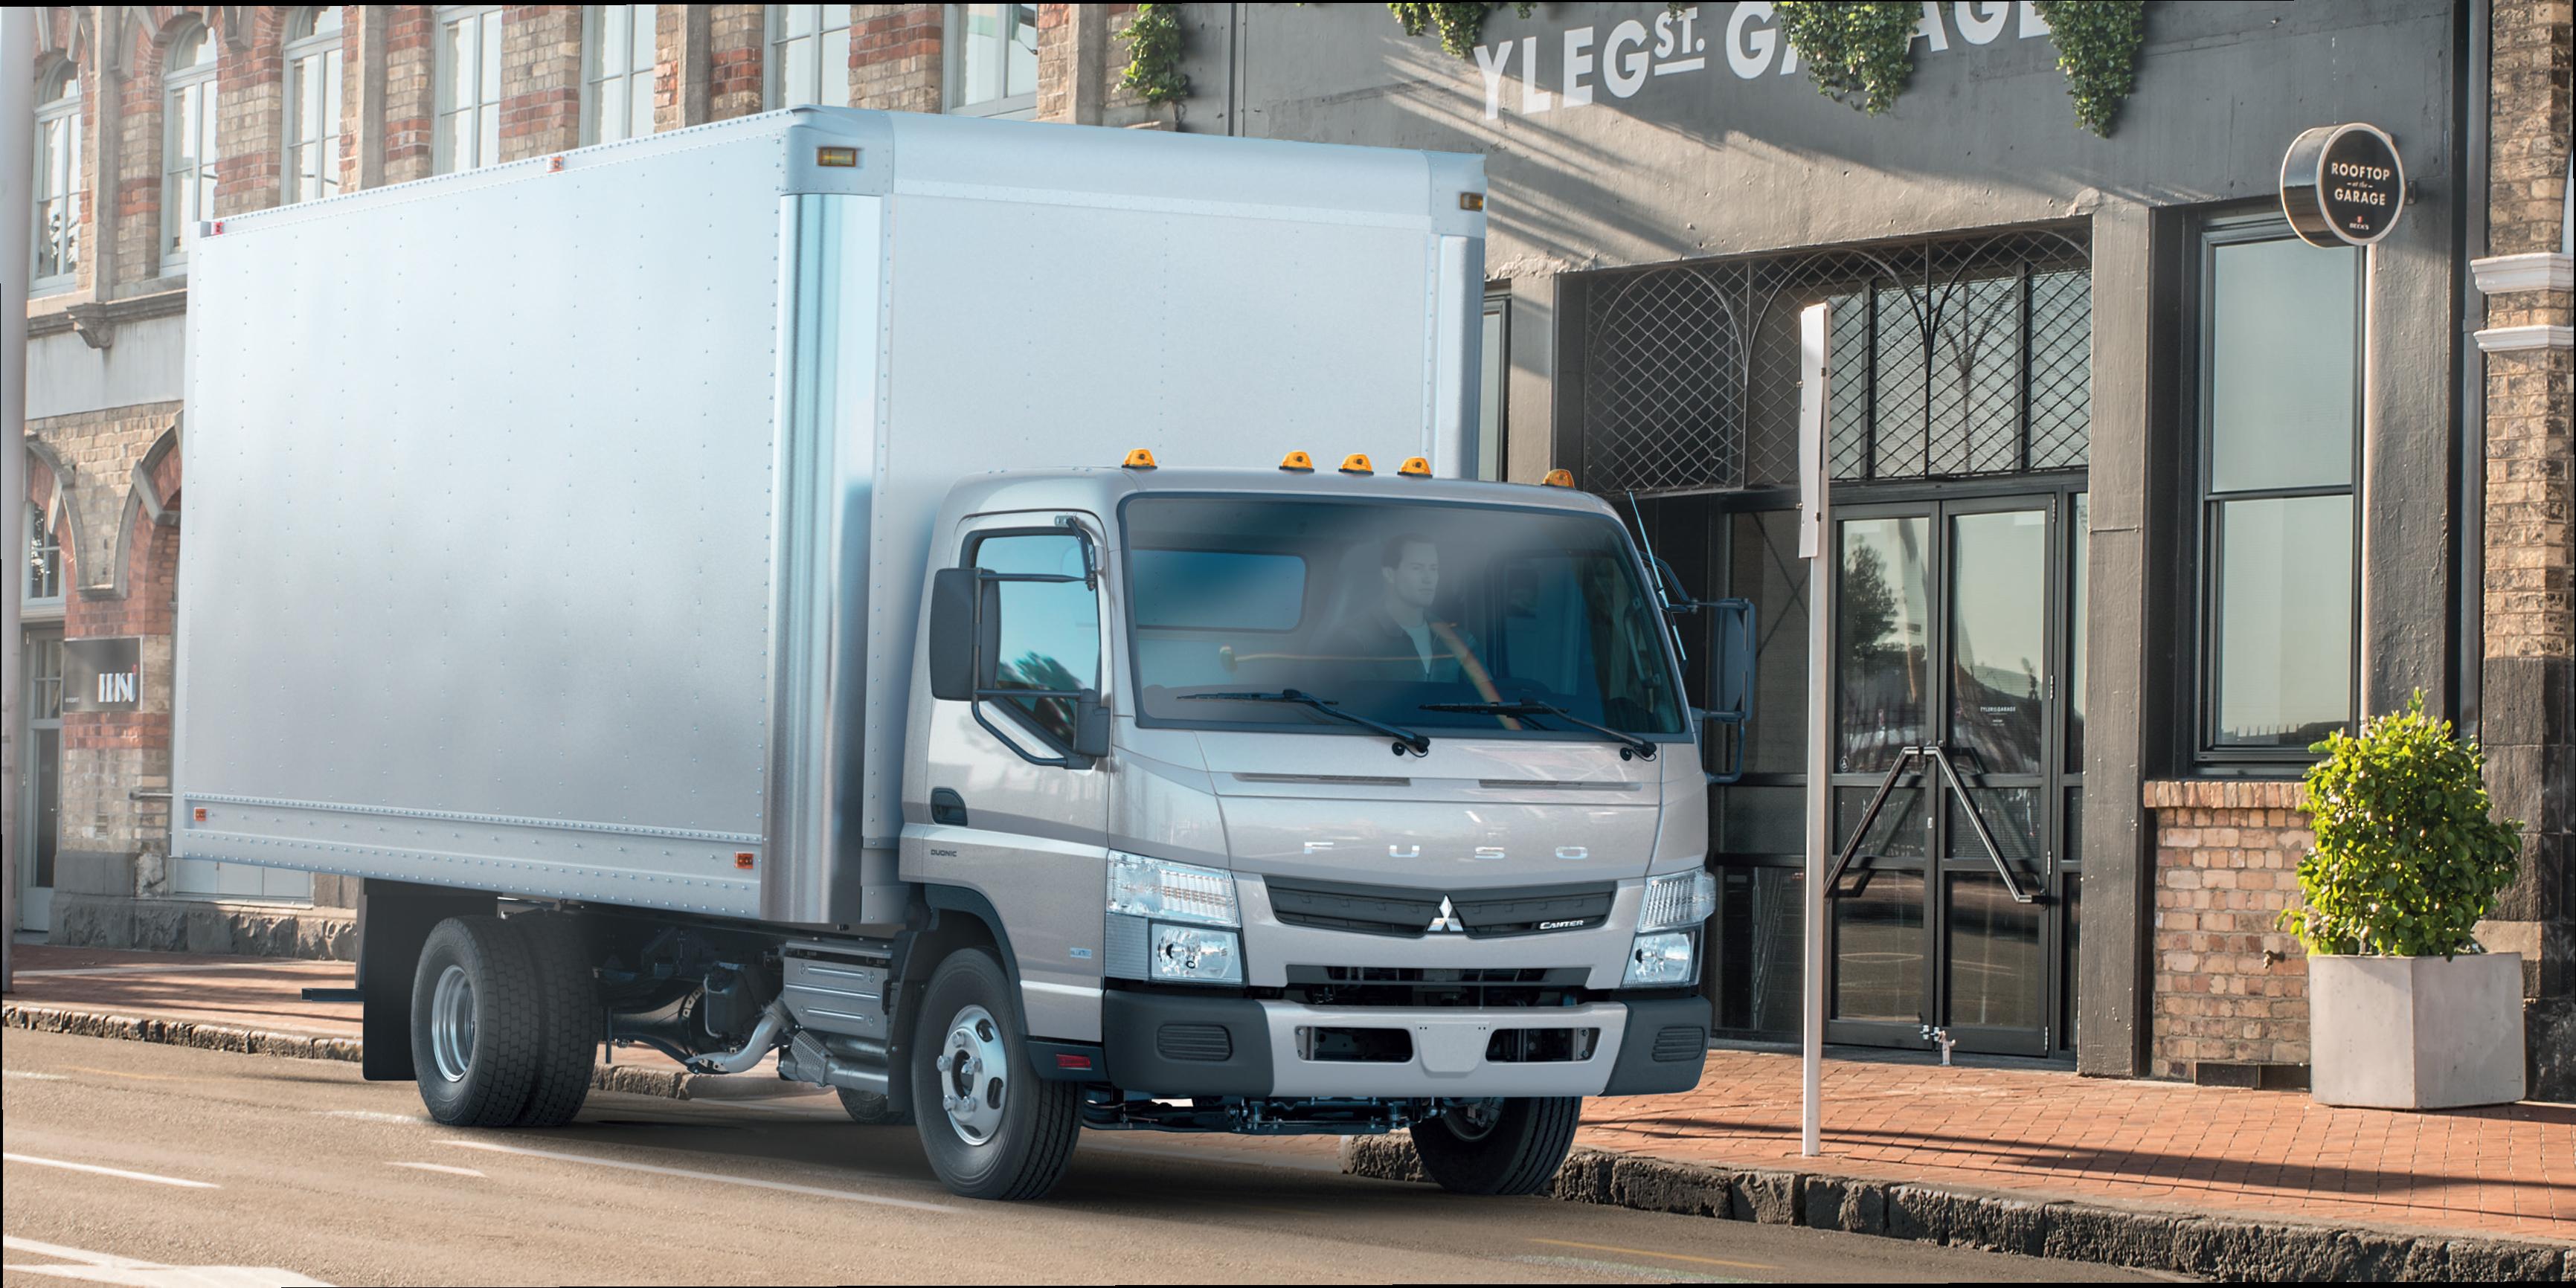 Mitsubishi Fuso Introduces Higher-GVWR Class 3 Truck